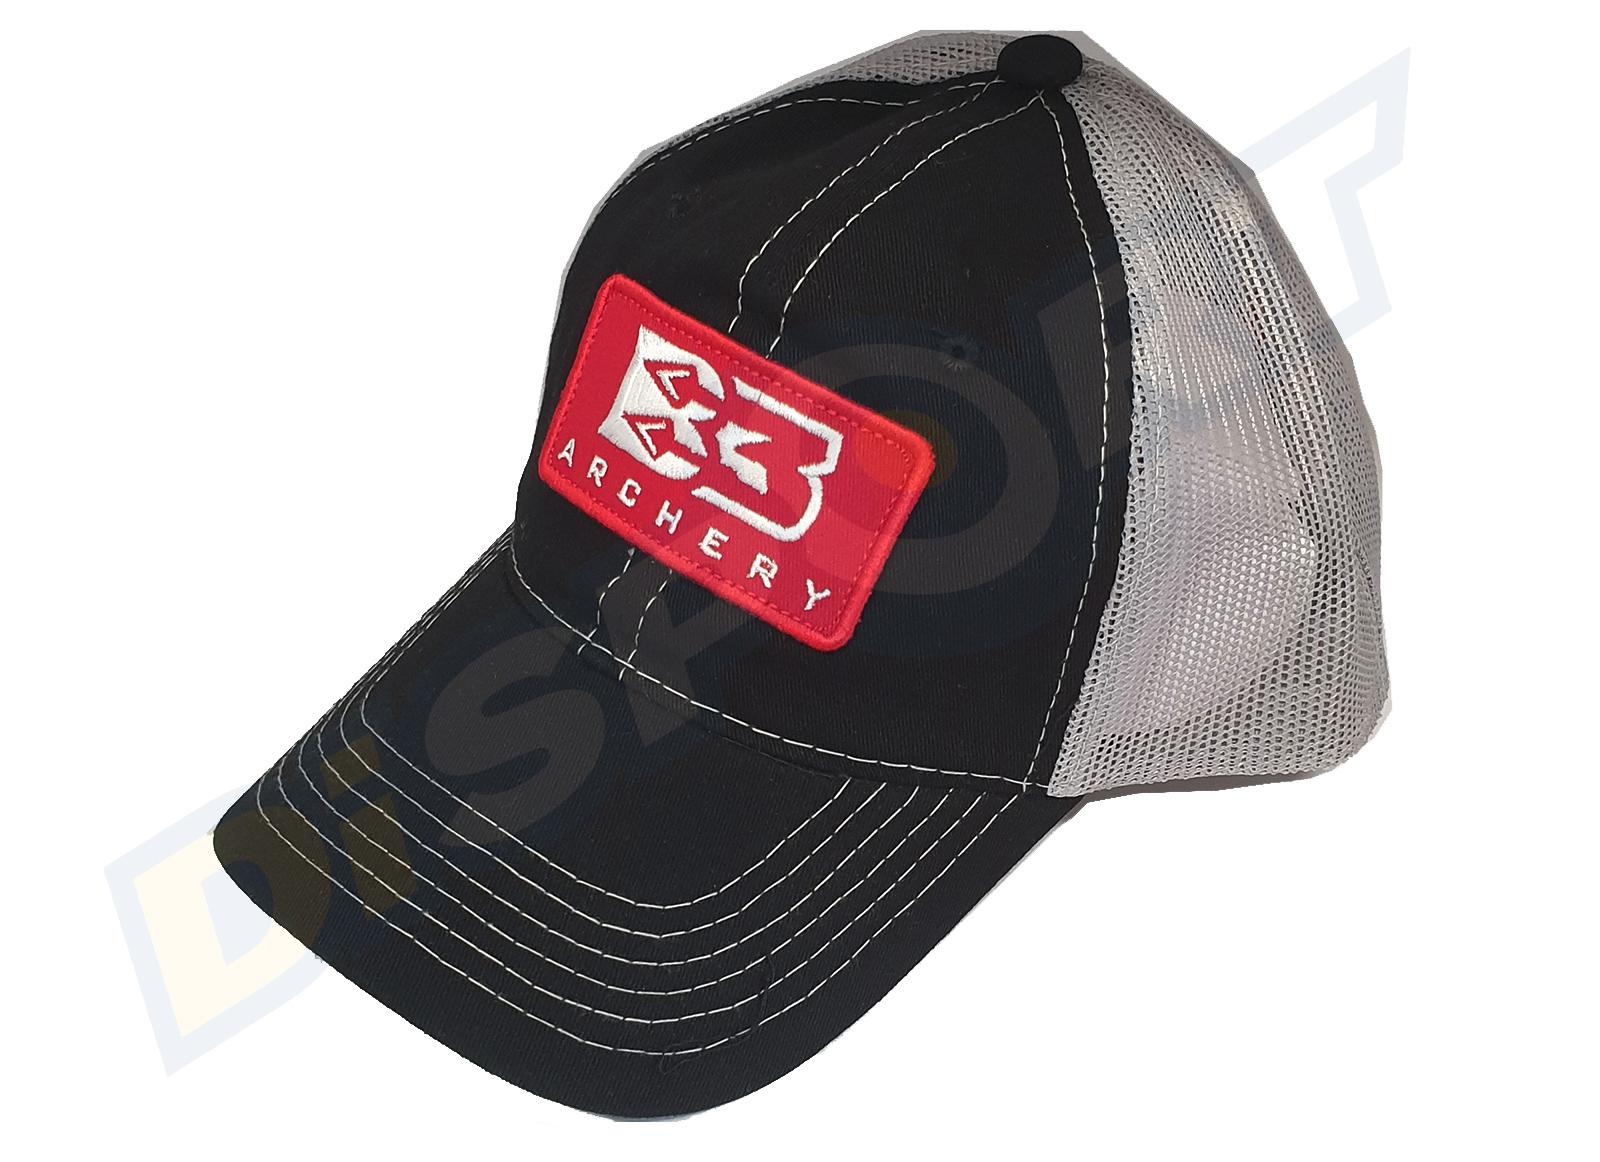 B3 ARCHERY BRAND CAP